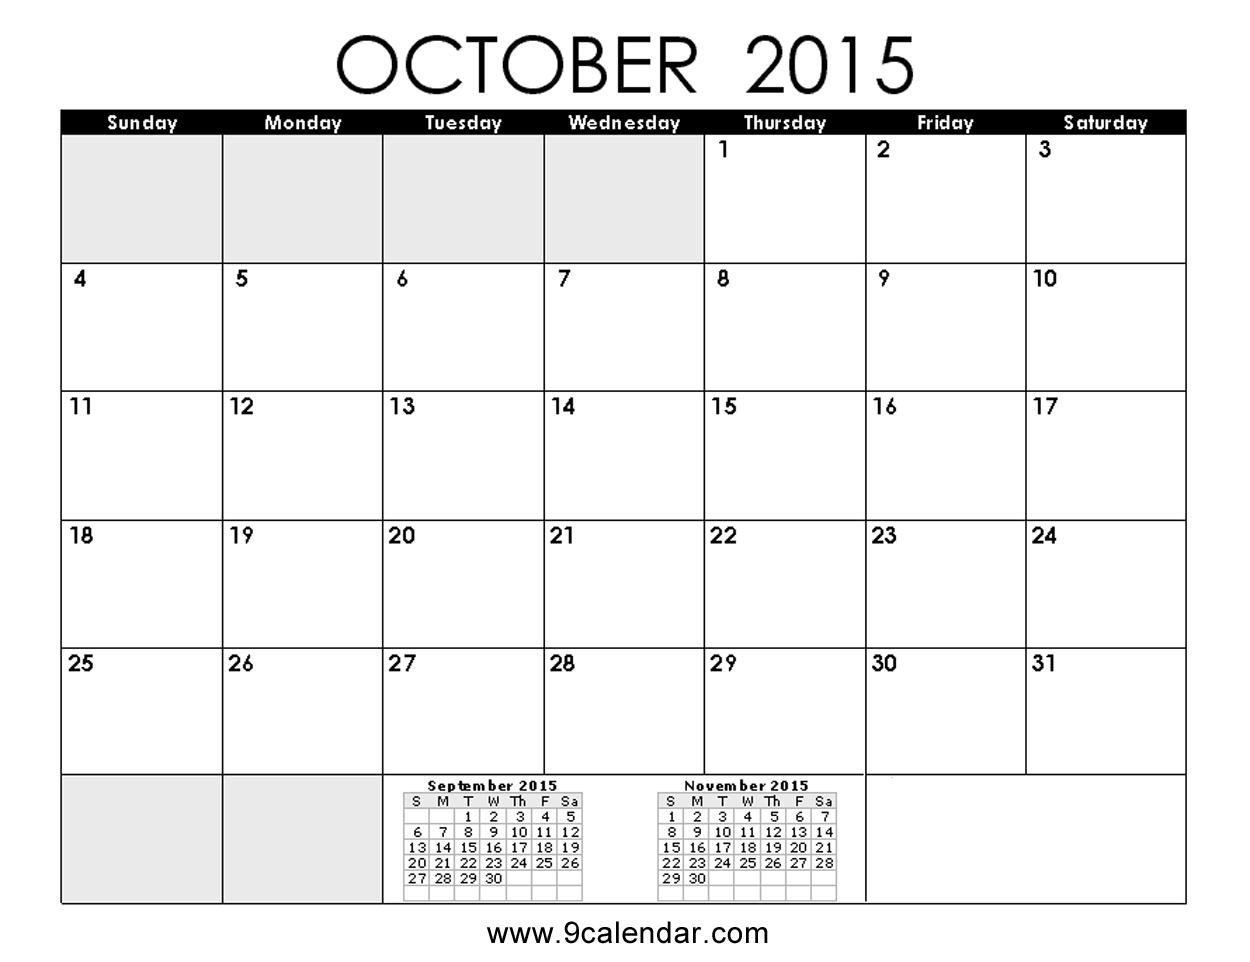 Free printable october 2015 calendar clipart clipground october 2015 calendar printable template saigontimesfo